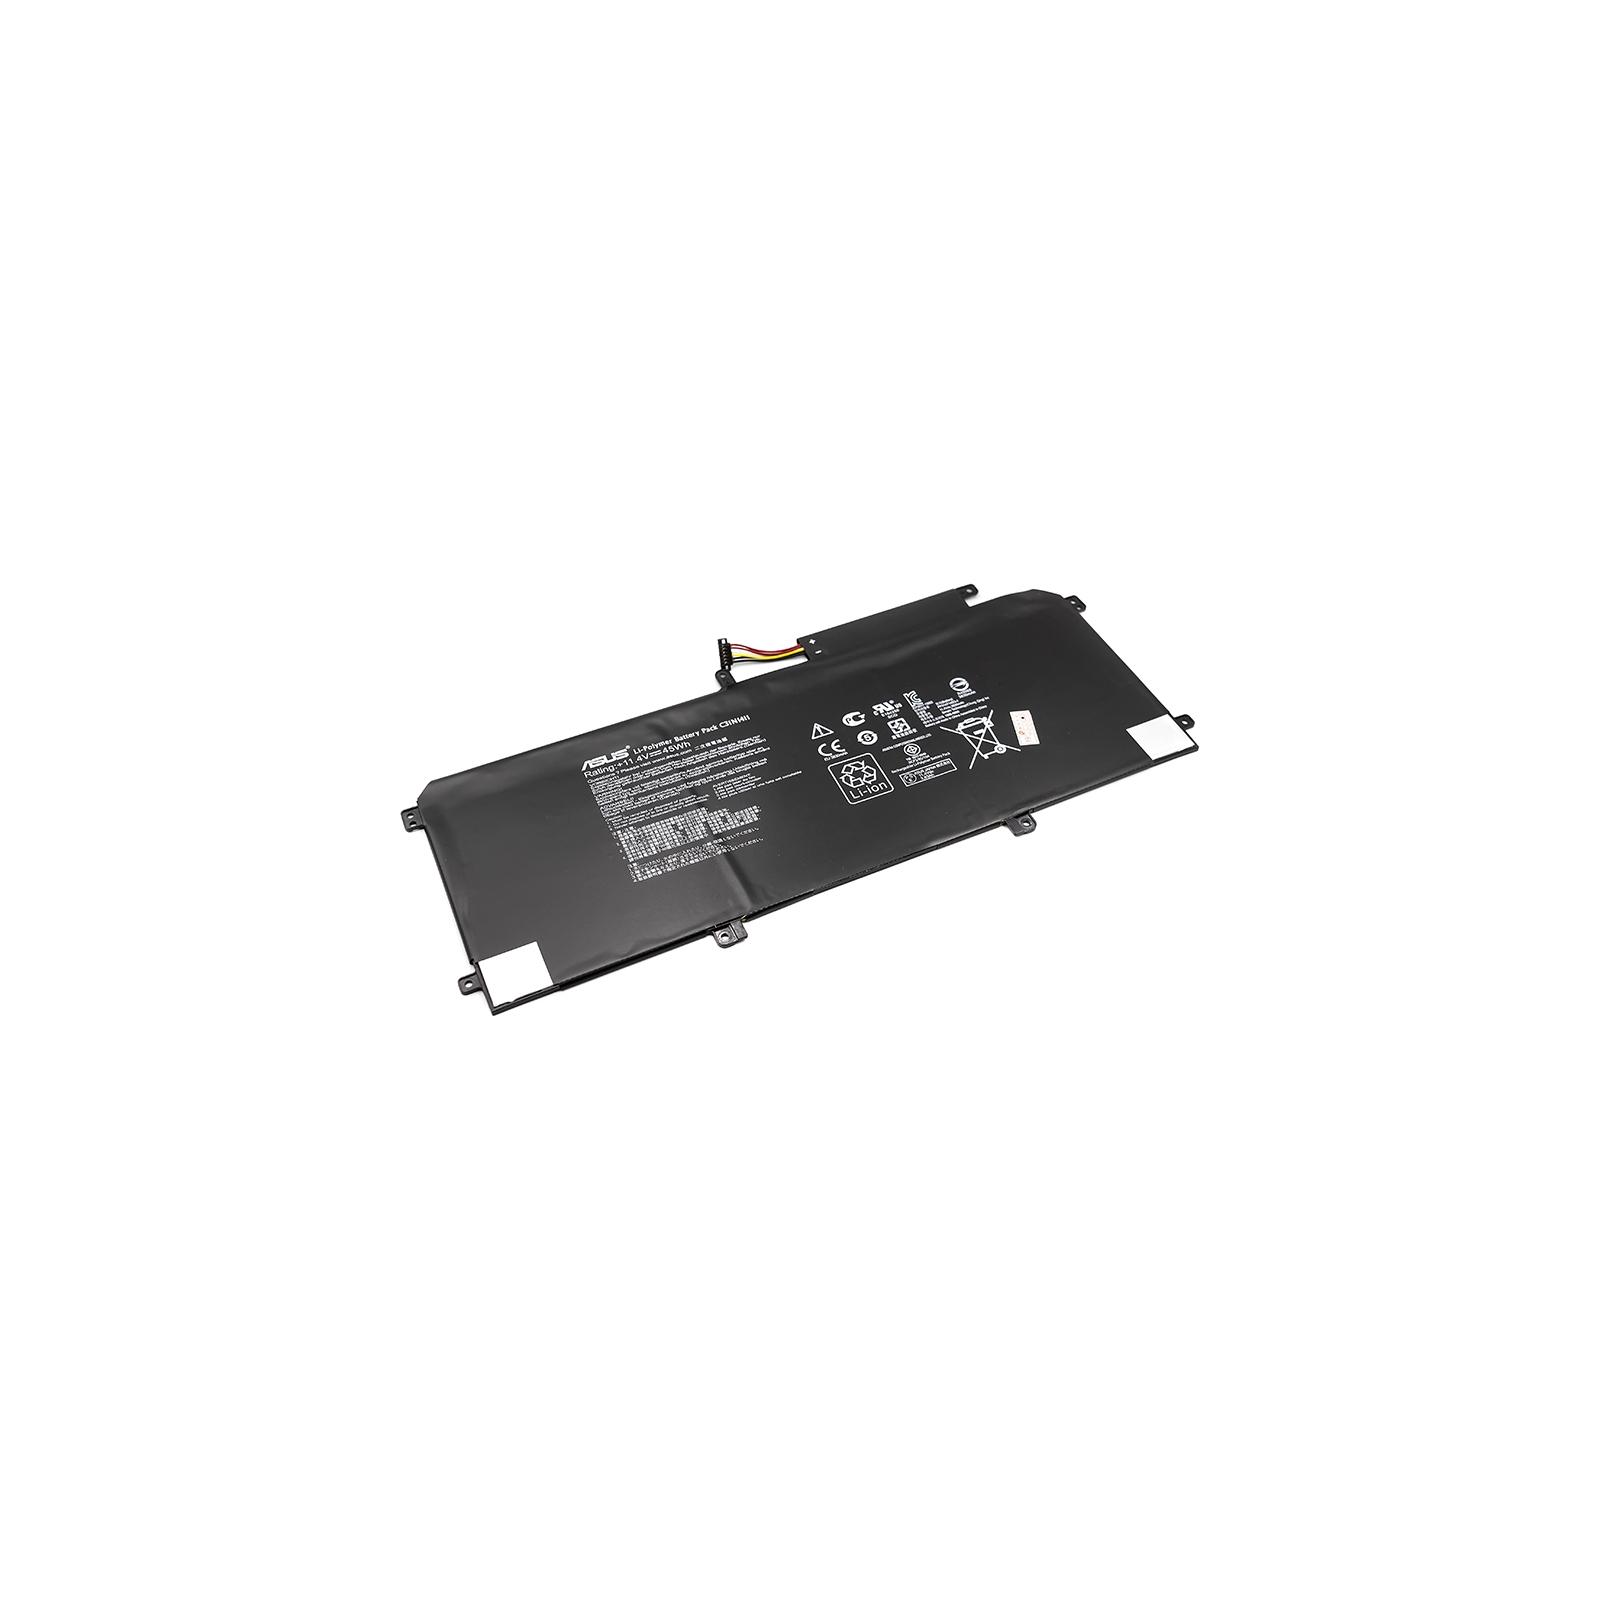 Аккумулятор для ноутбука ASUS Zenbook UX305 (C31N1411) 11.4V 45Wh (NB430901)